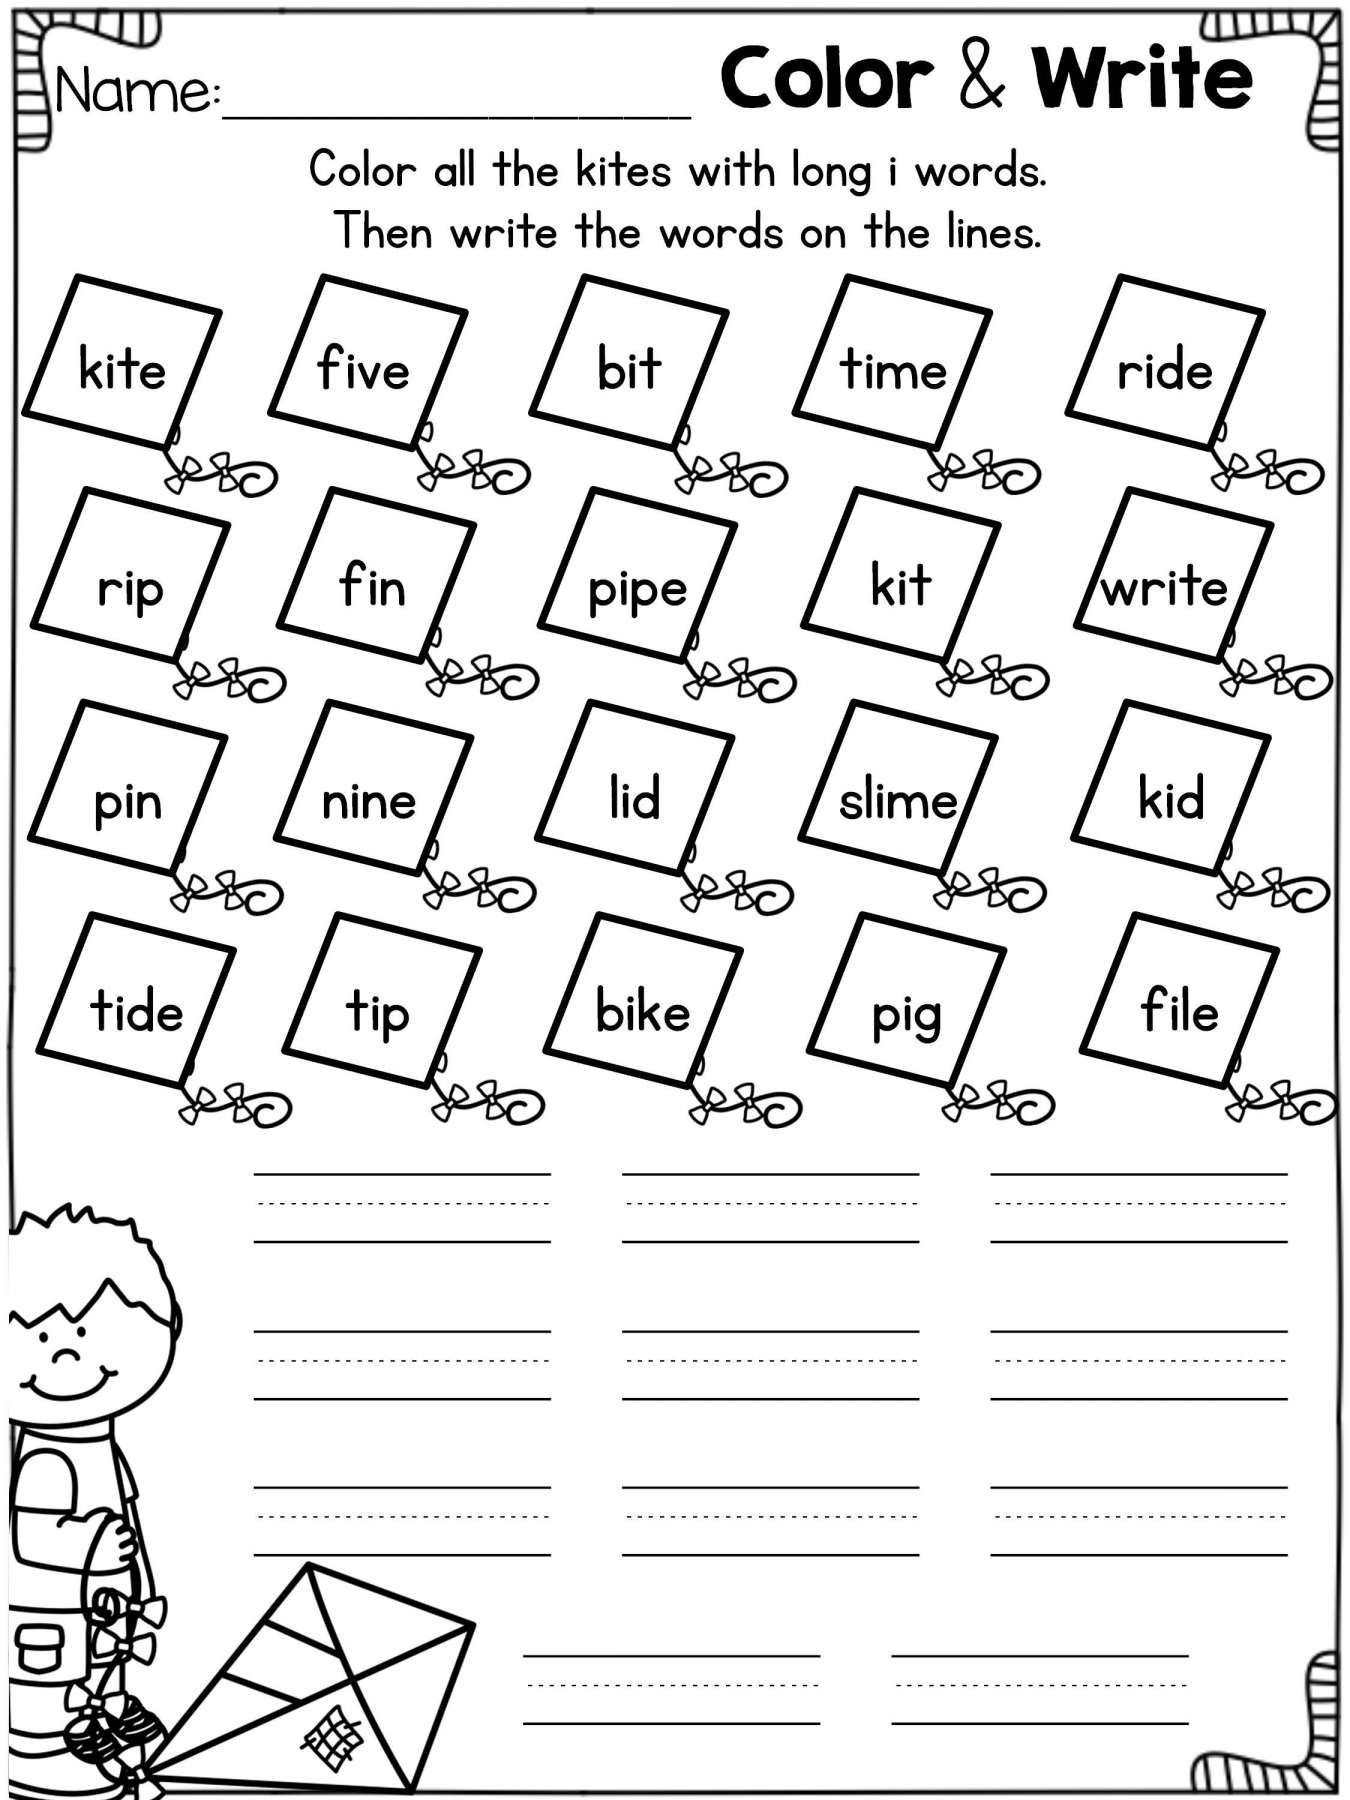 11 Long Vowel Worksheet For Kindergarten Long Vowel Worksheets Vowel Worksheets Phonics Worksheets [ 1800 x 1350 Pixel ]